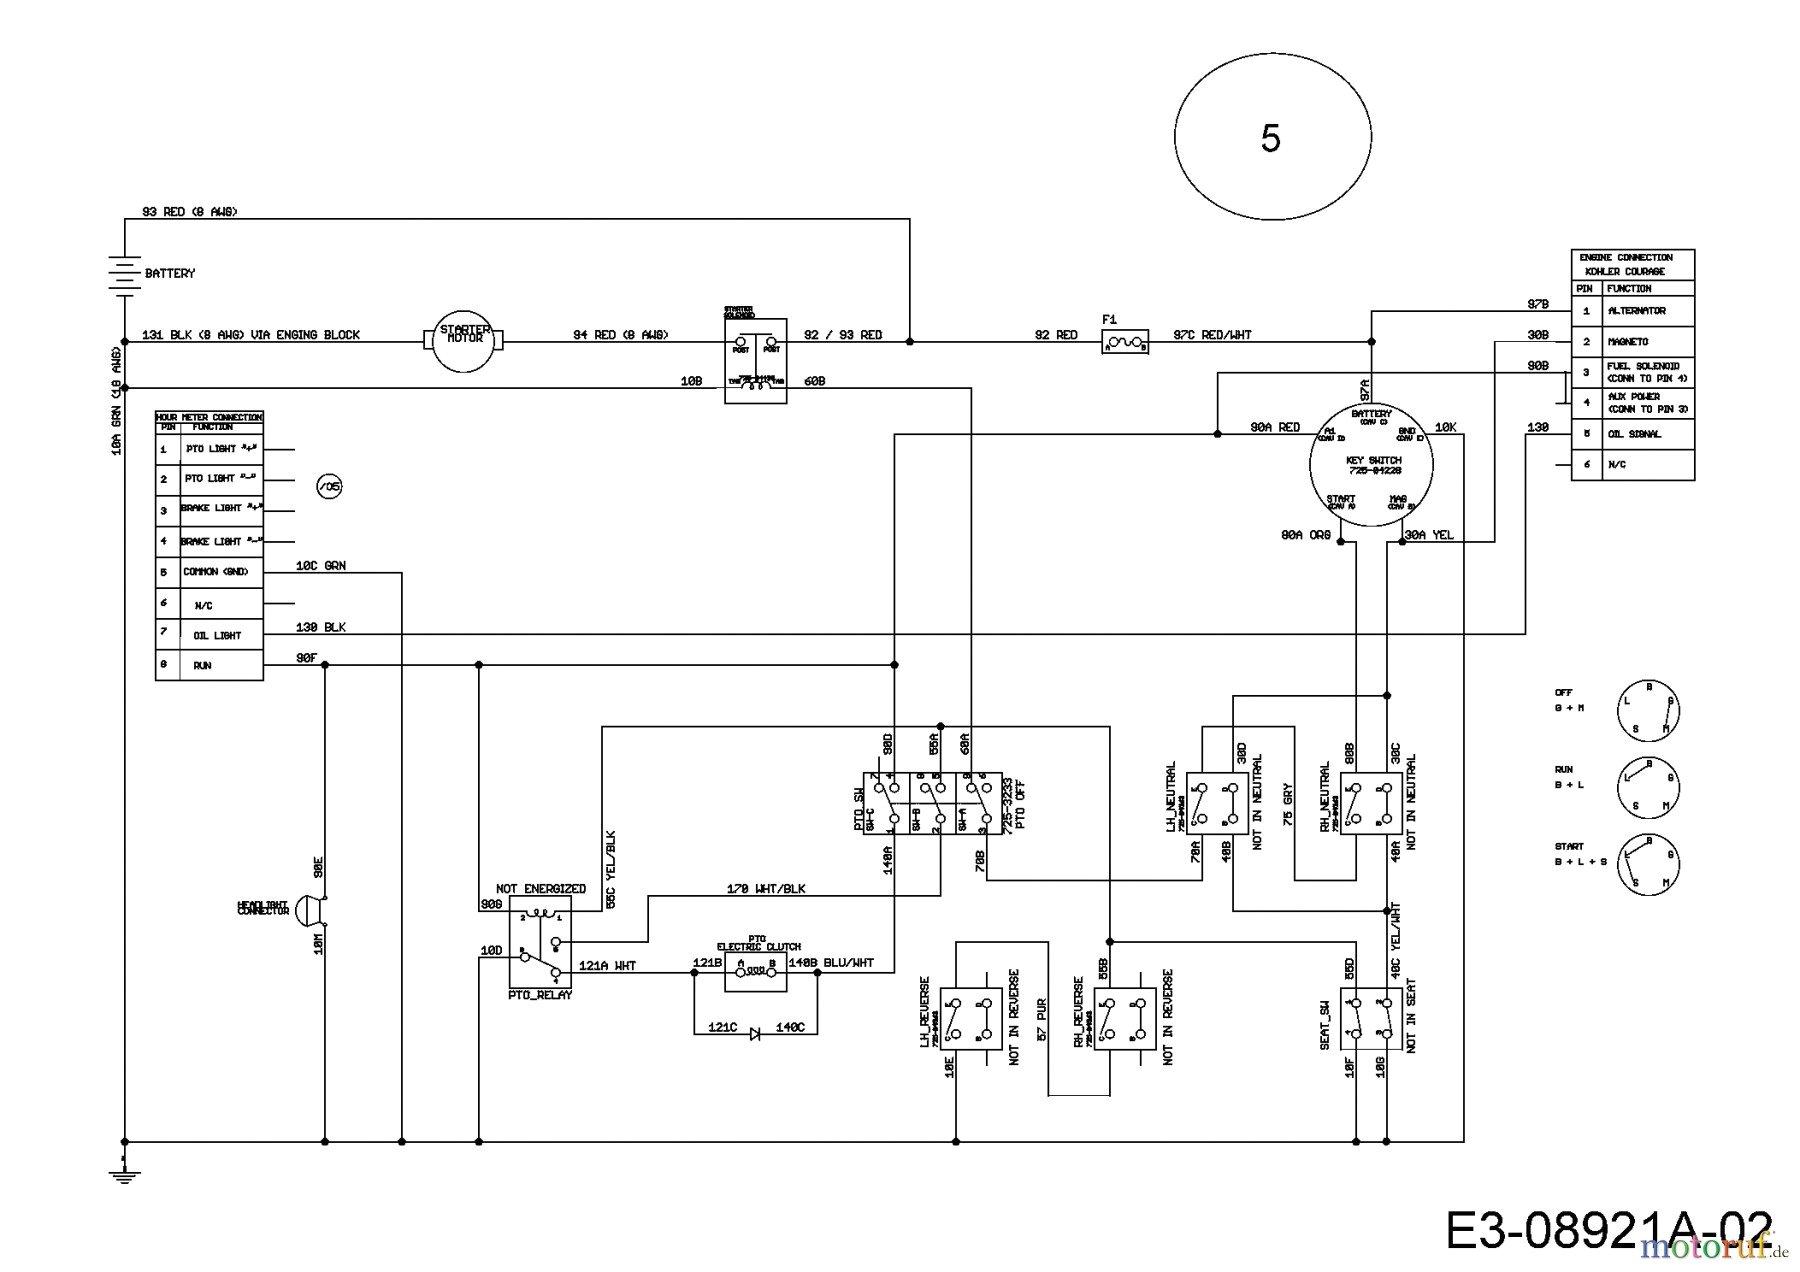 massey ferguson 135 wiring diagram dynamo lovely massey ferguson 135 wiring diagram luxury mf 135 diesel wiring